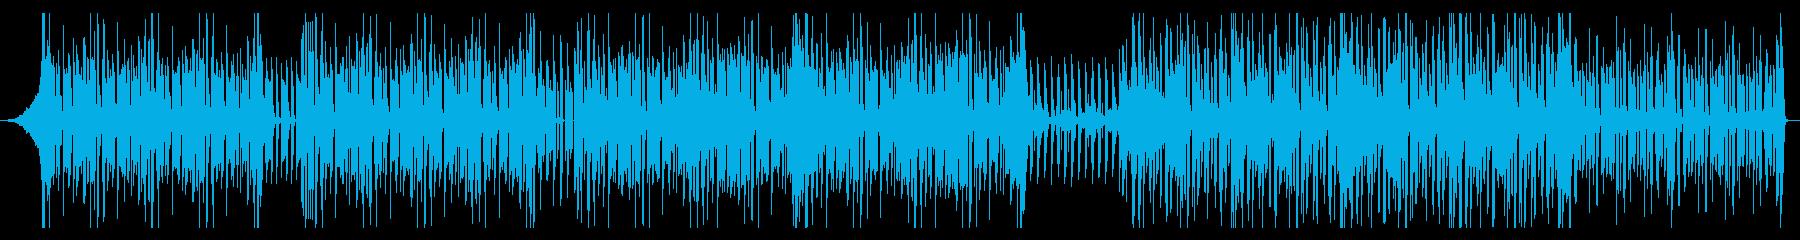 texture3の再生済みの波形